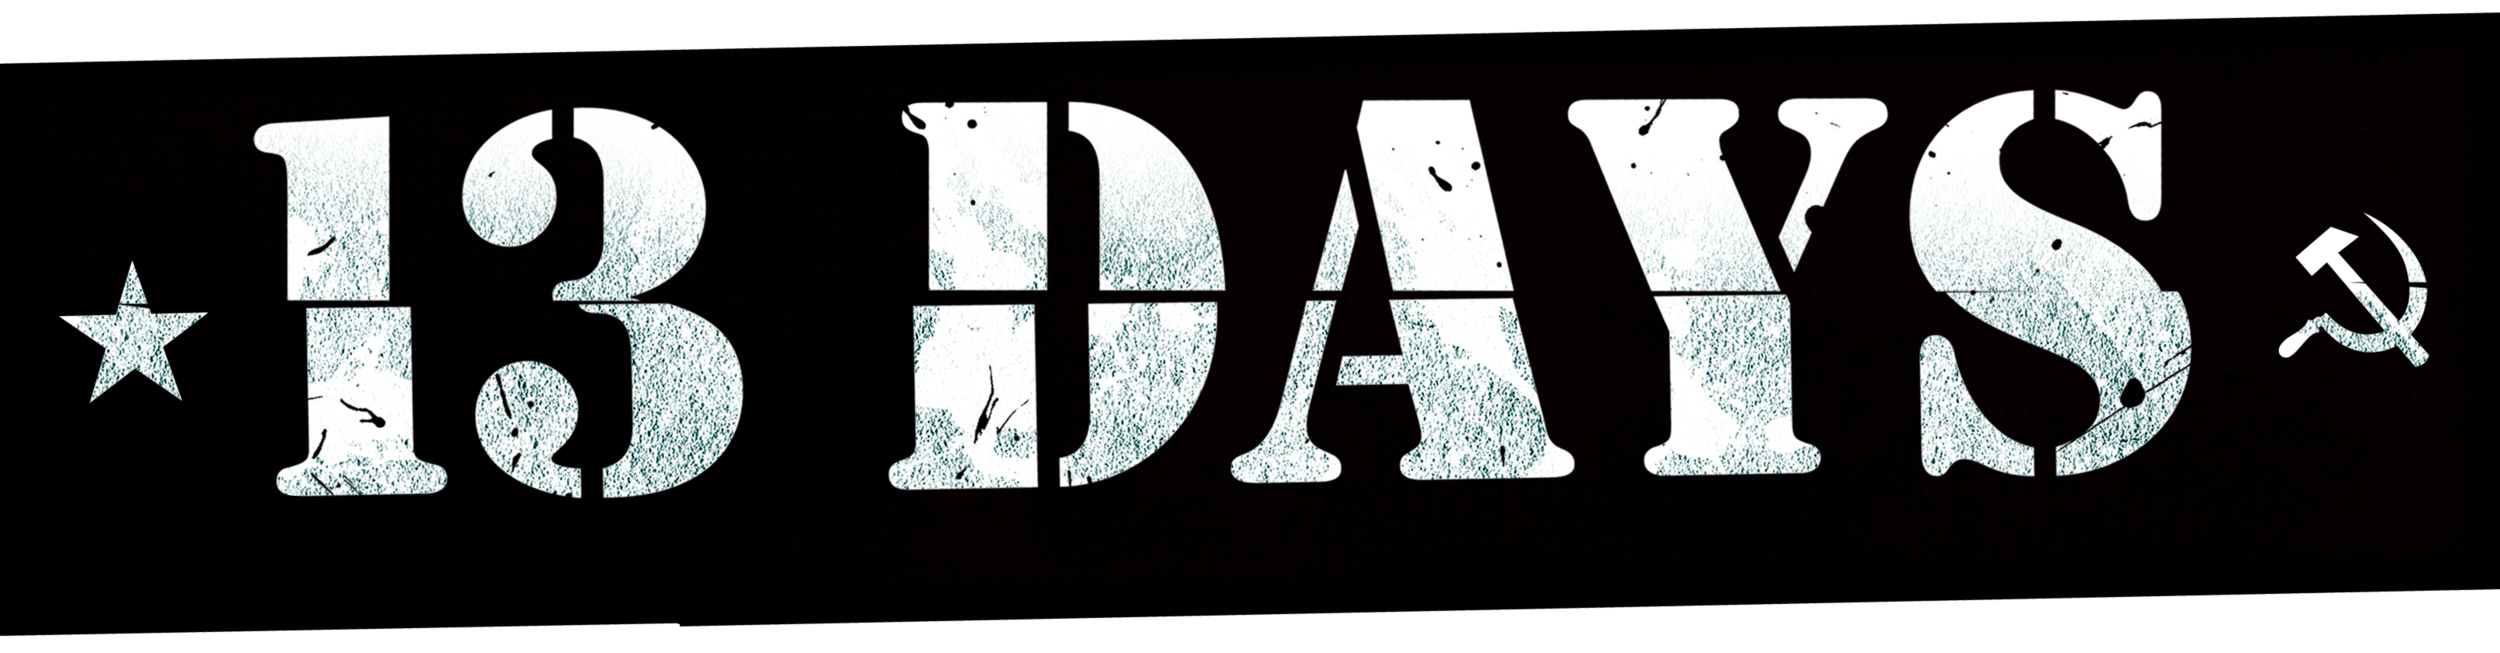 13Days-black logo.PNG